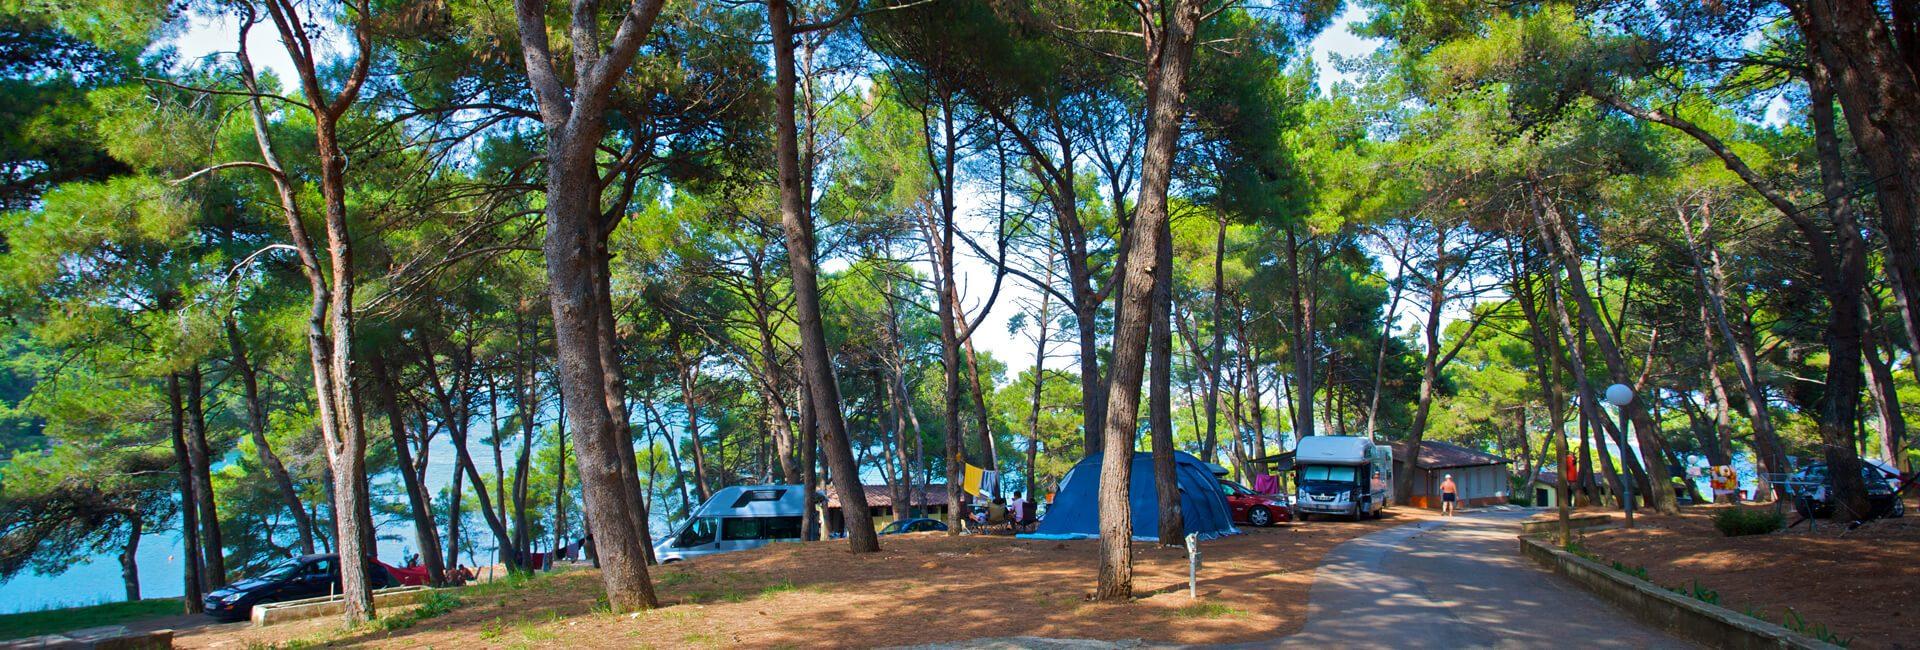 Camping Arena Runke